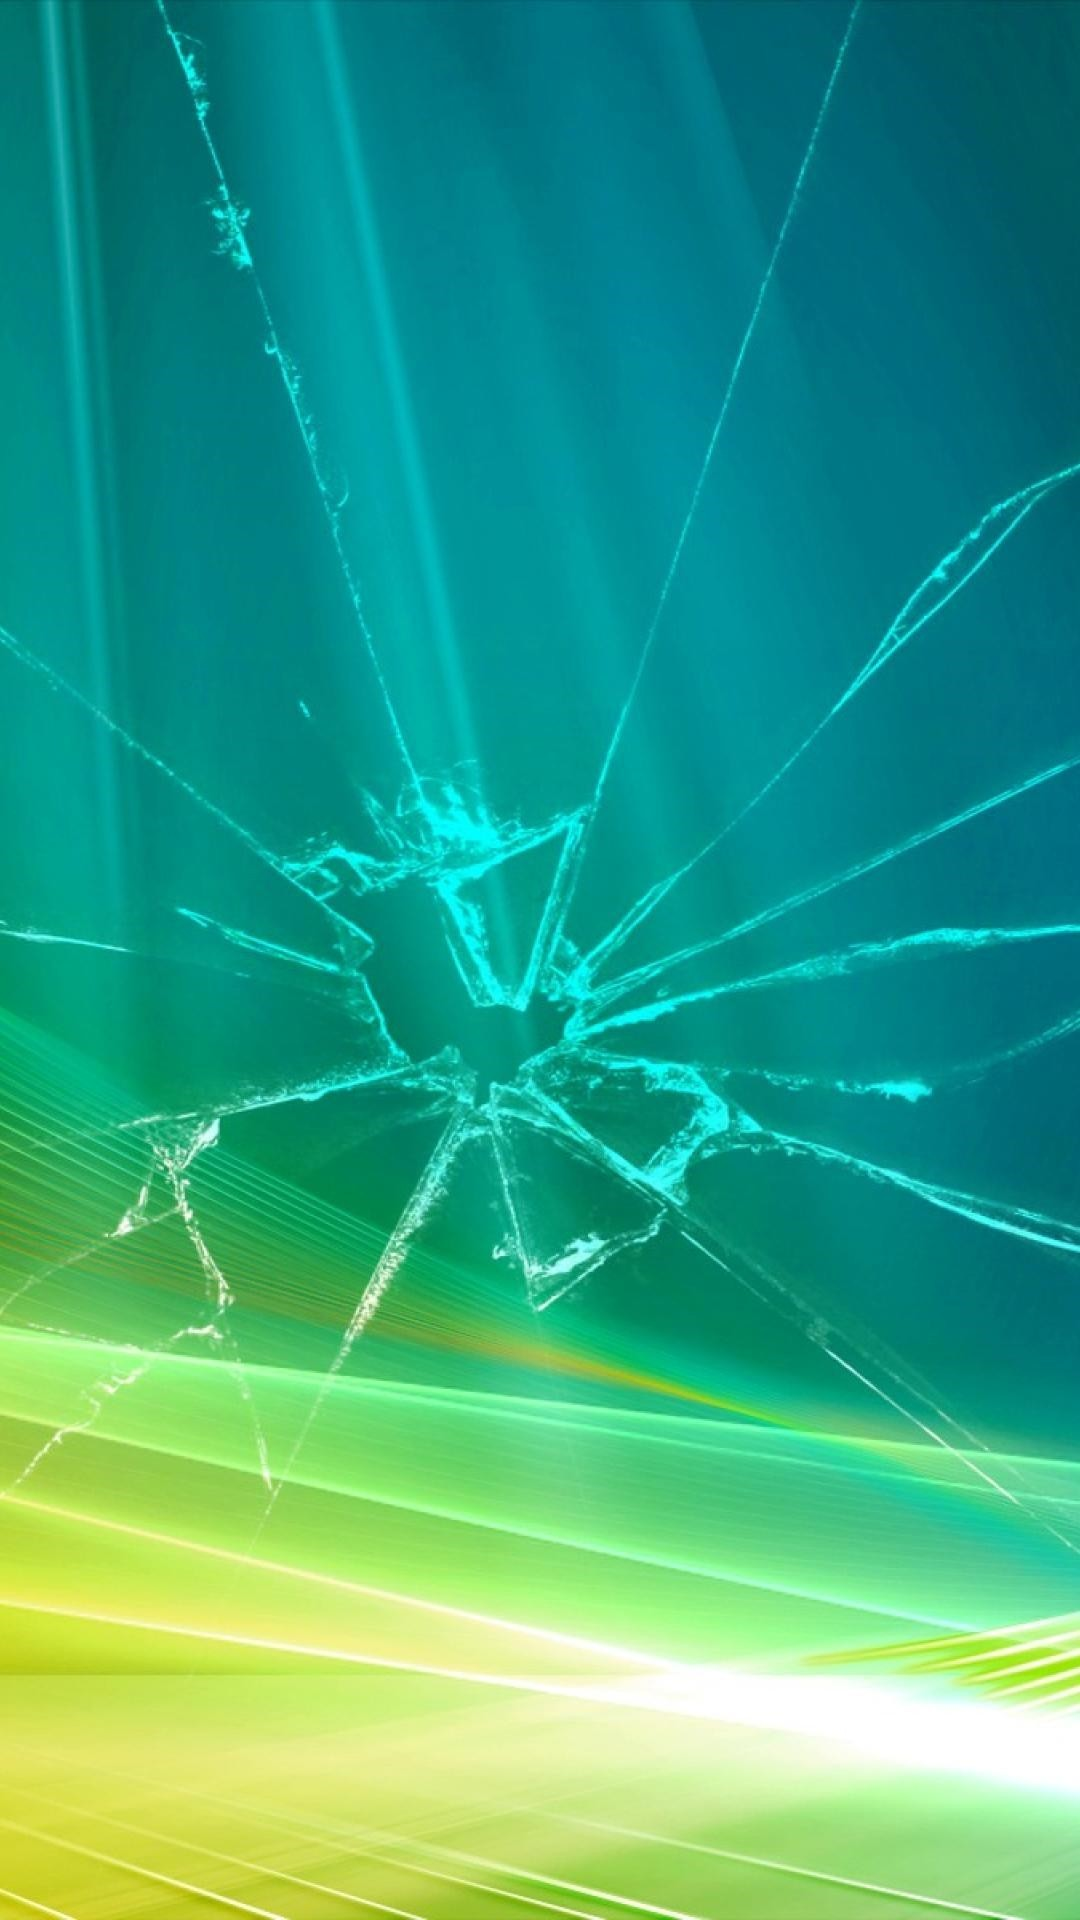 Cracked Screen phone background